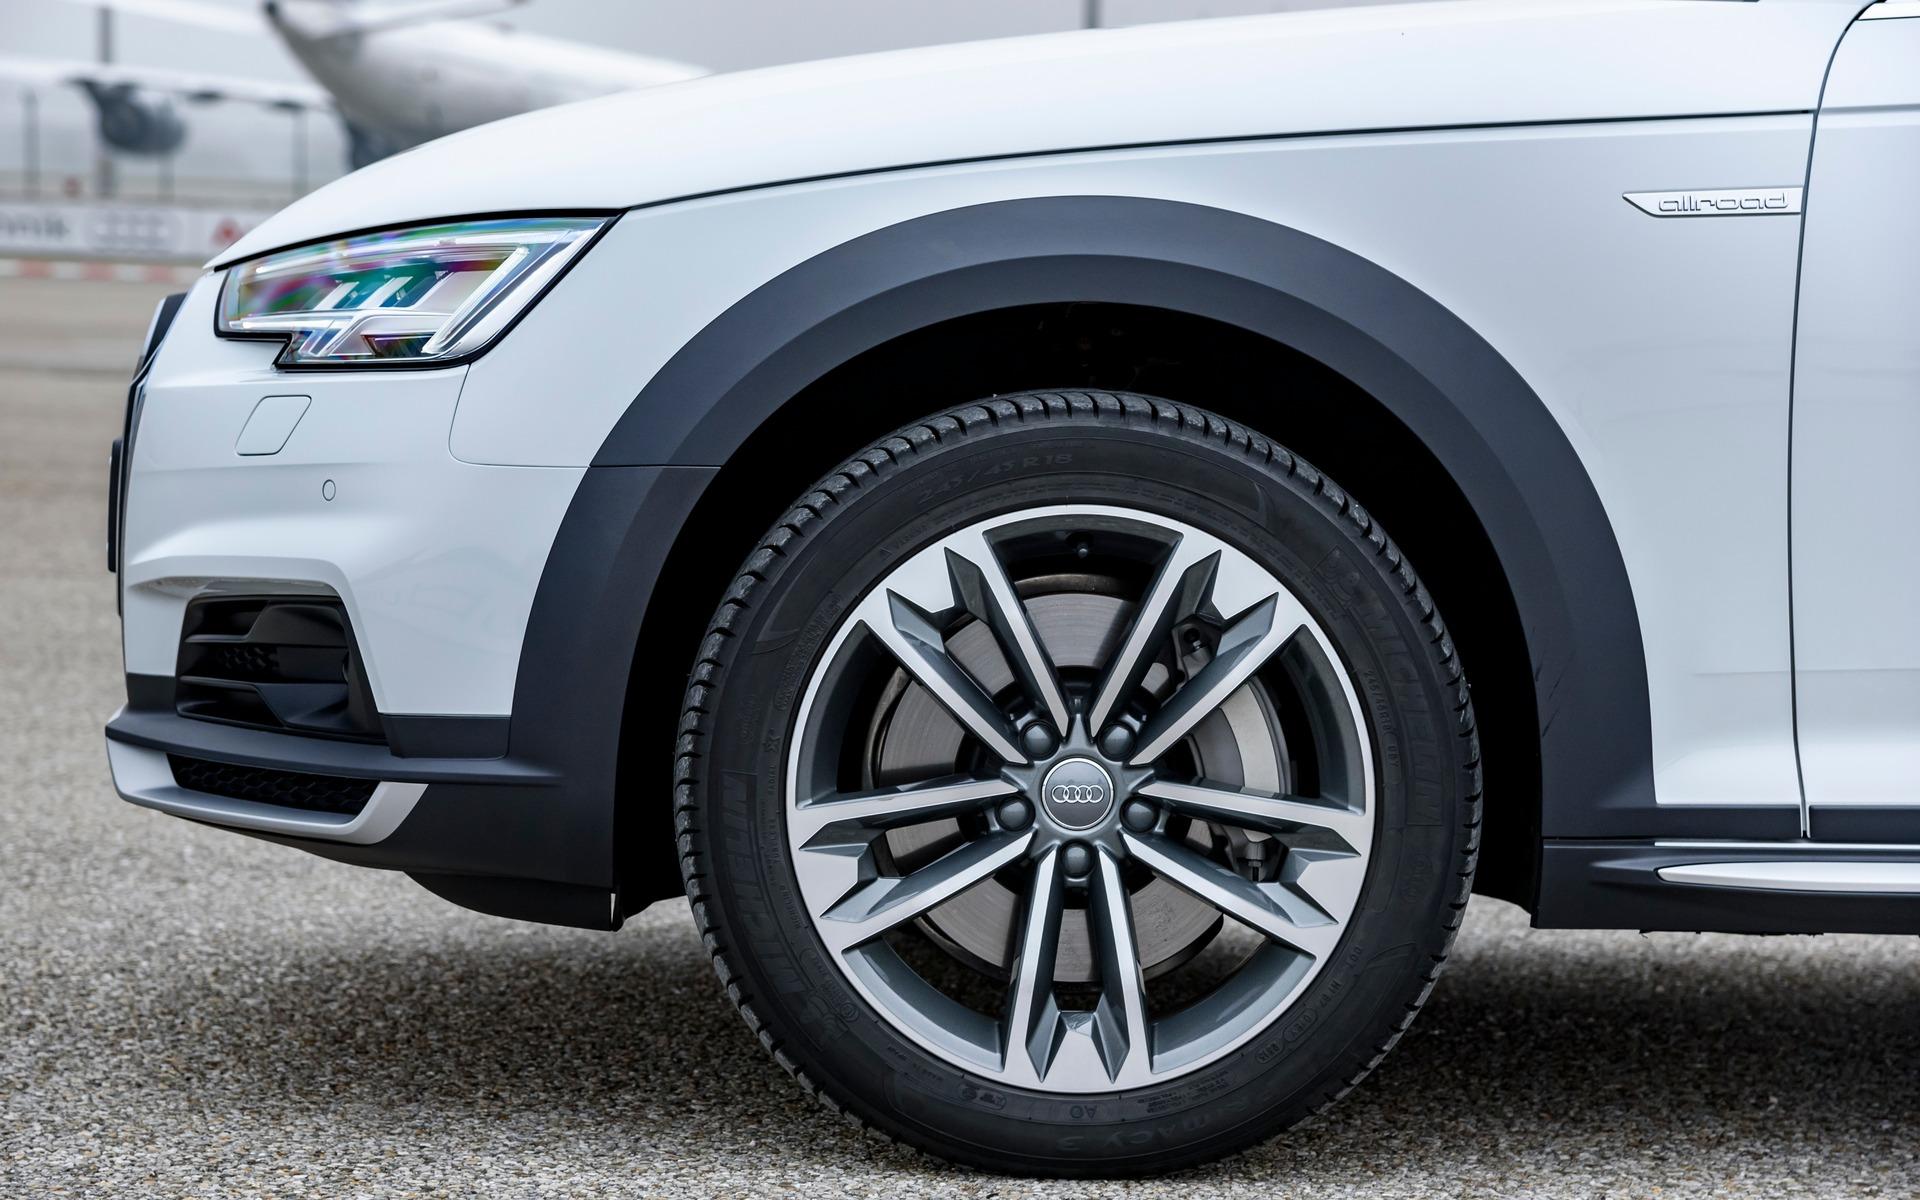 2017 Audi A4 Allroad The Suv Alternative For Connoisseurs